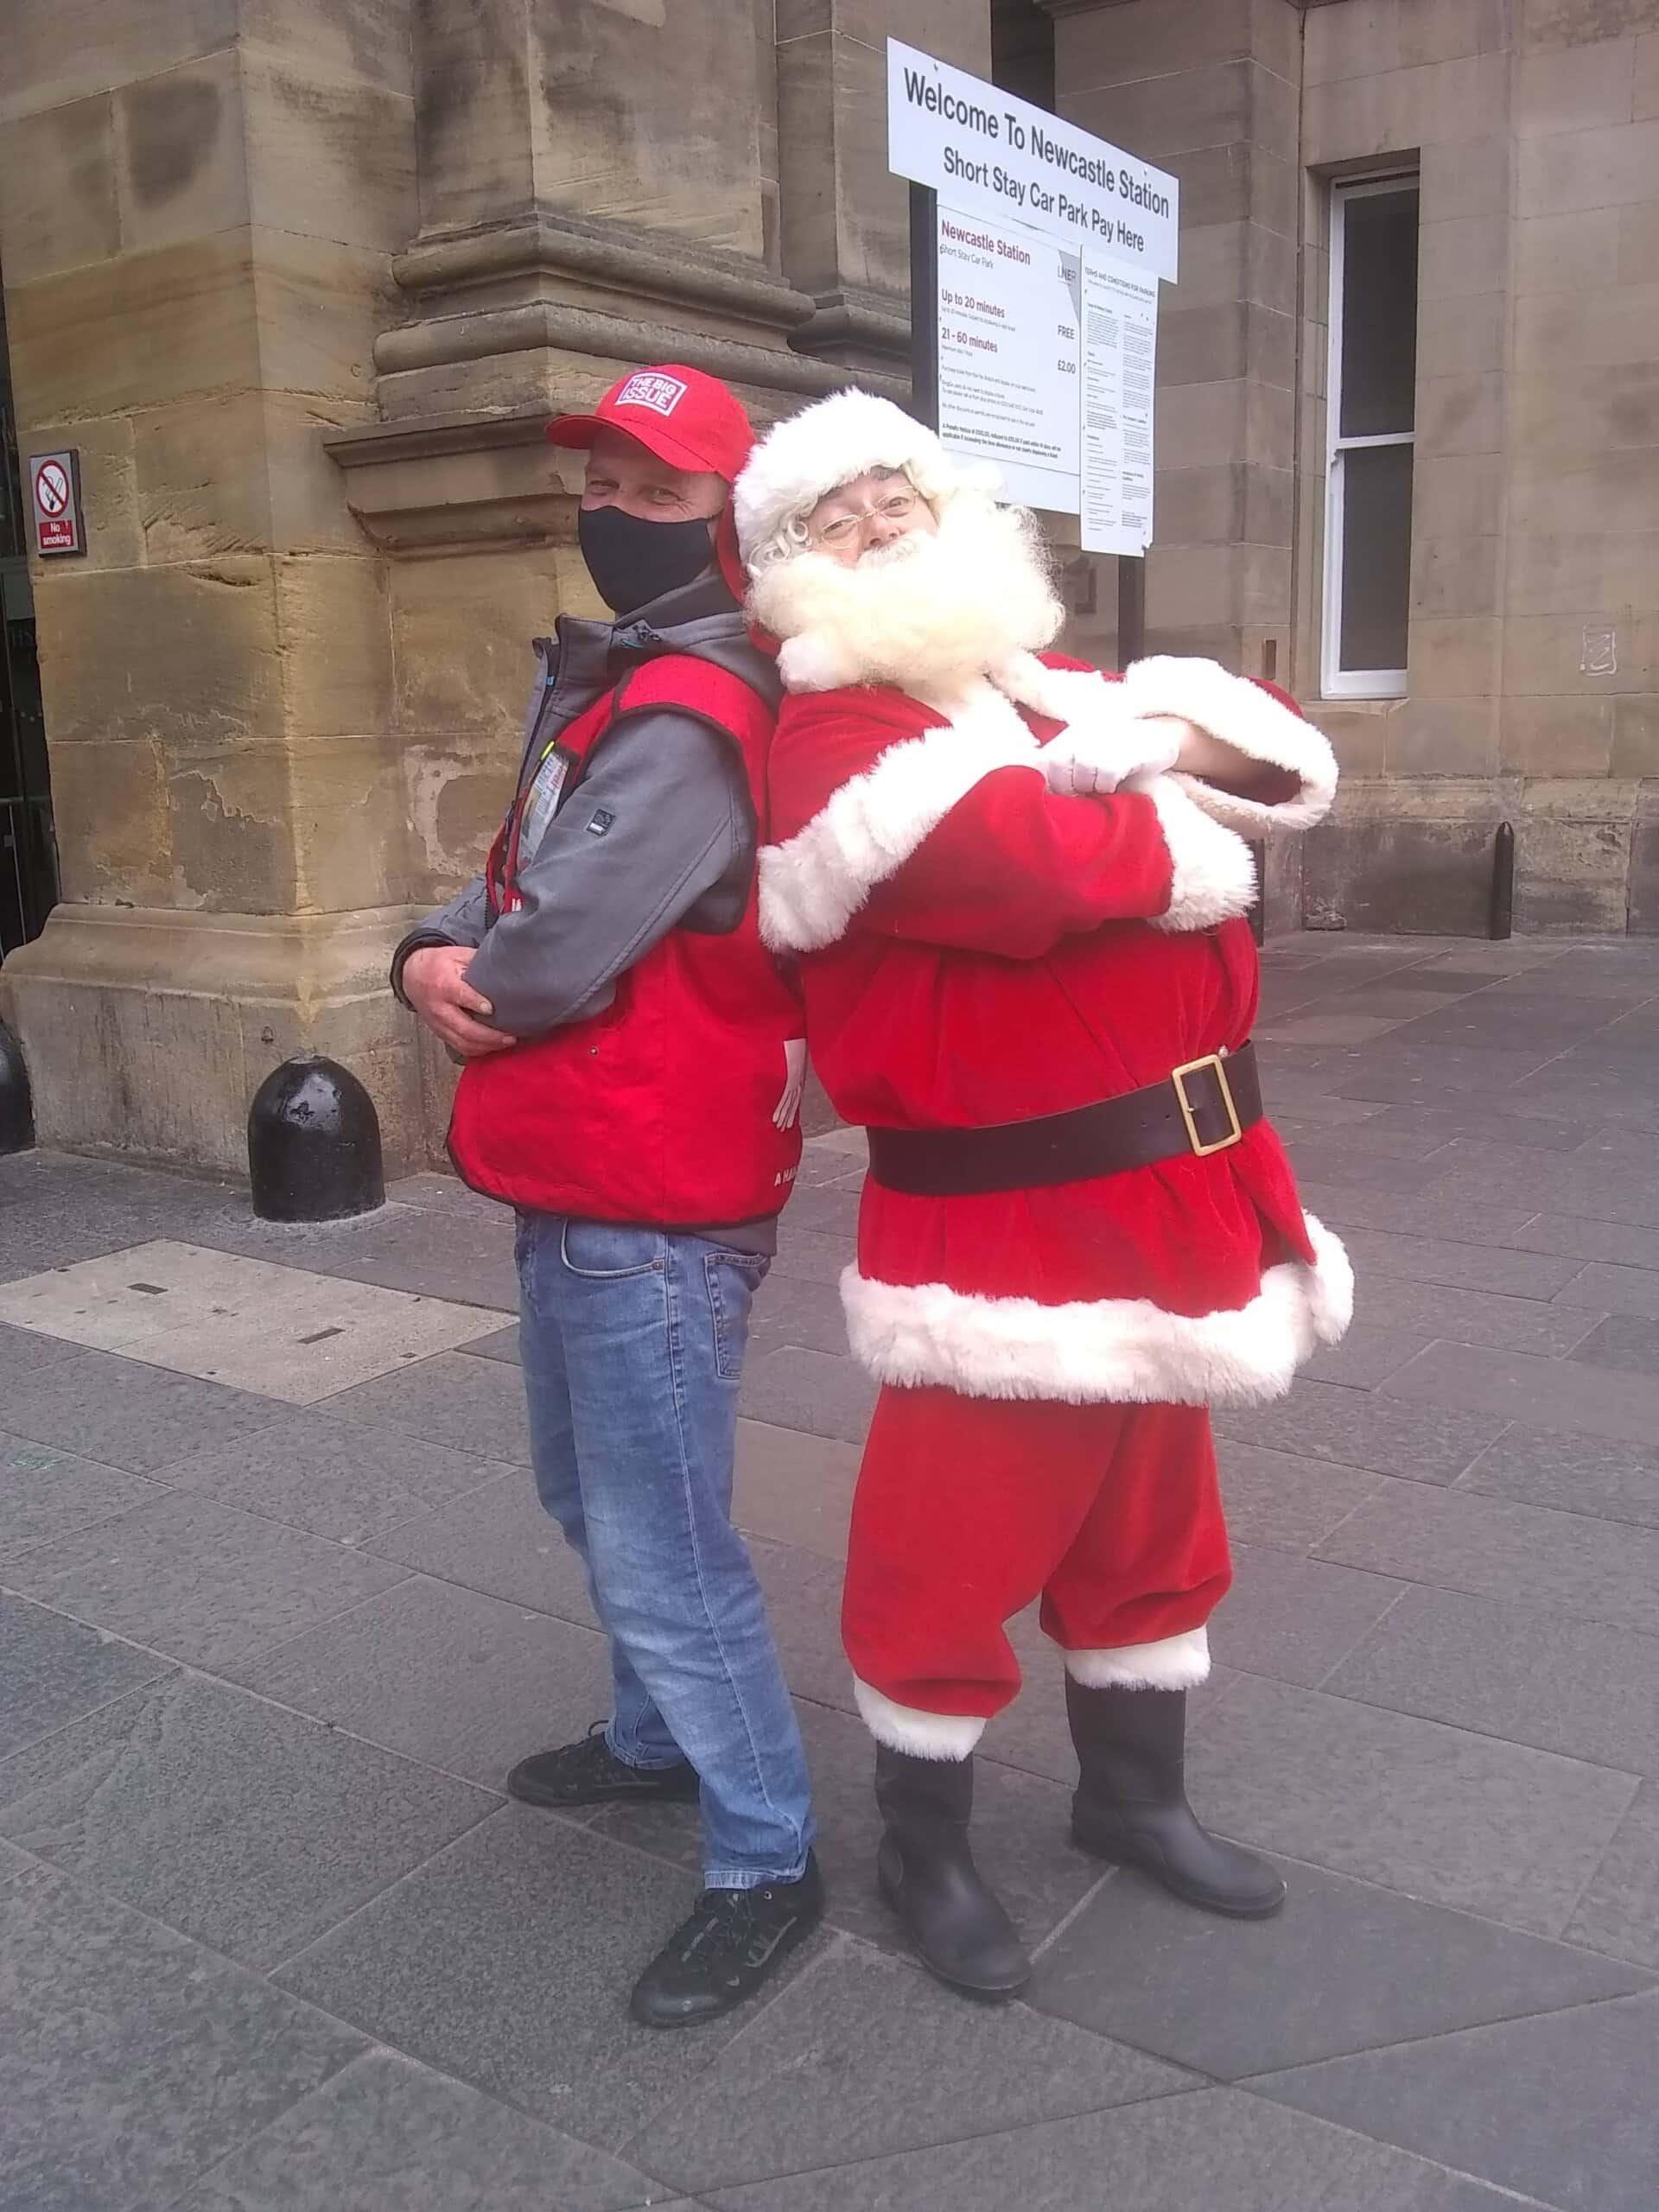 Earl Charlton Big Issue Vendor With Santa